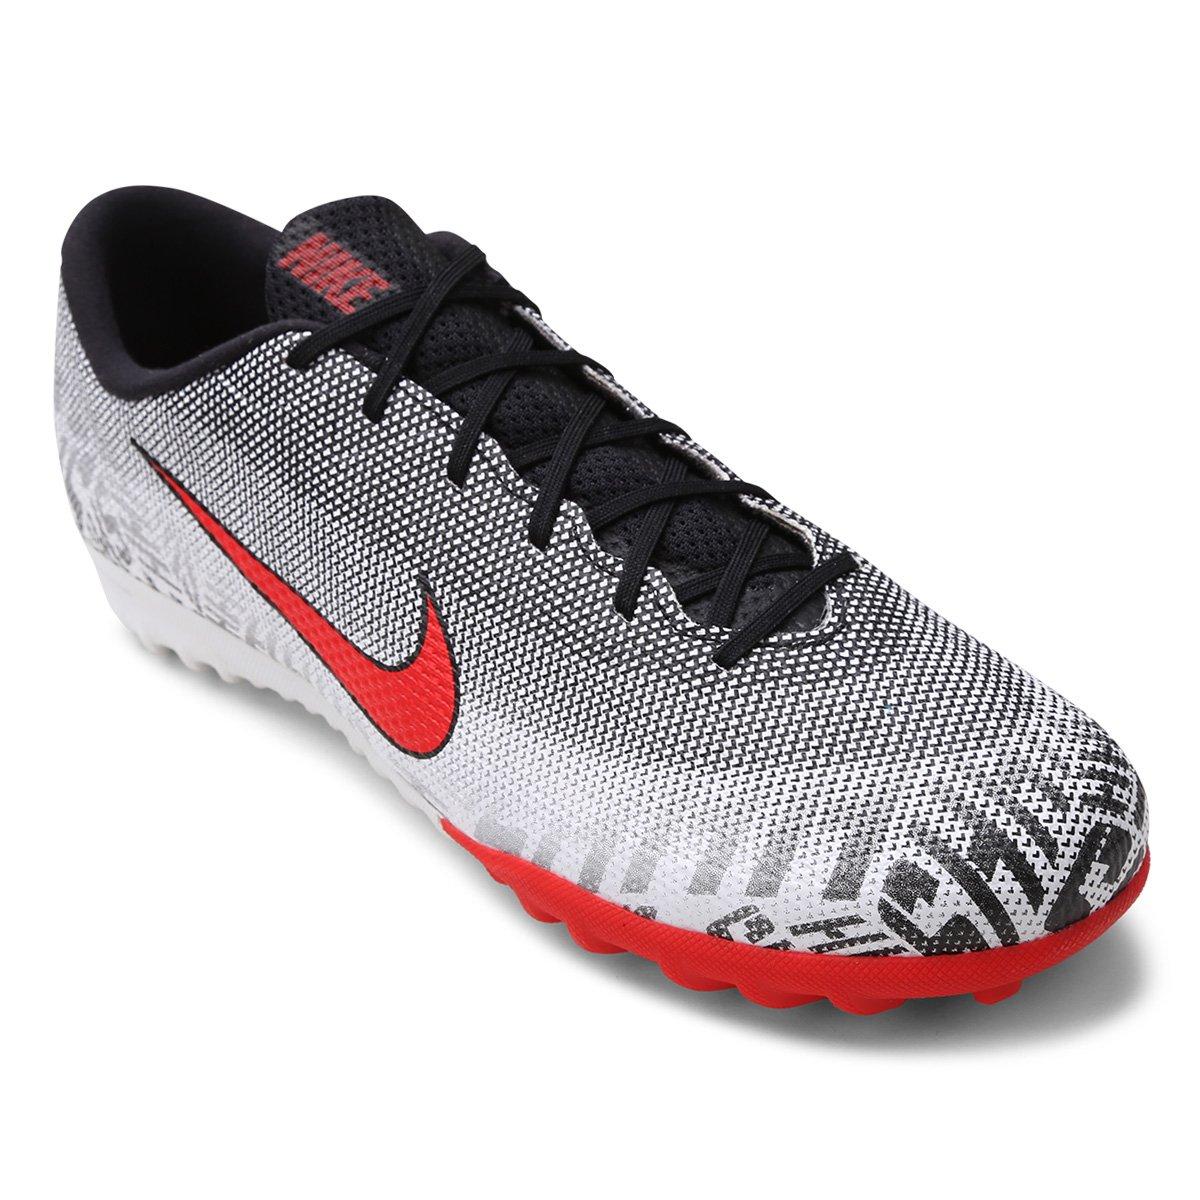 dfdd3bdd13 Chuteira Society Nike Mercurial Vapor 12 Academy Neymar Jr TF ...